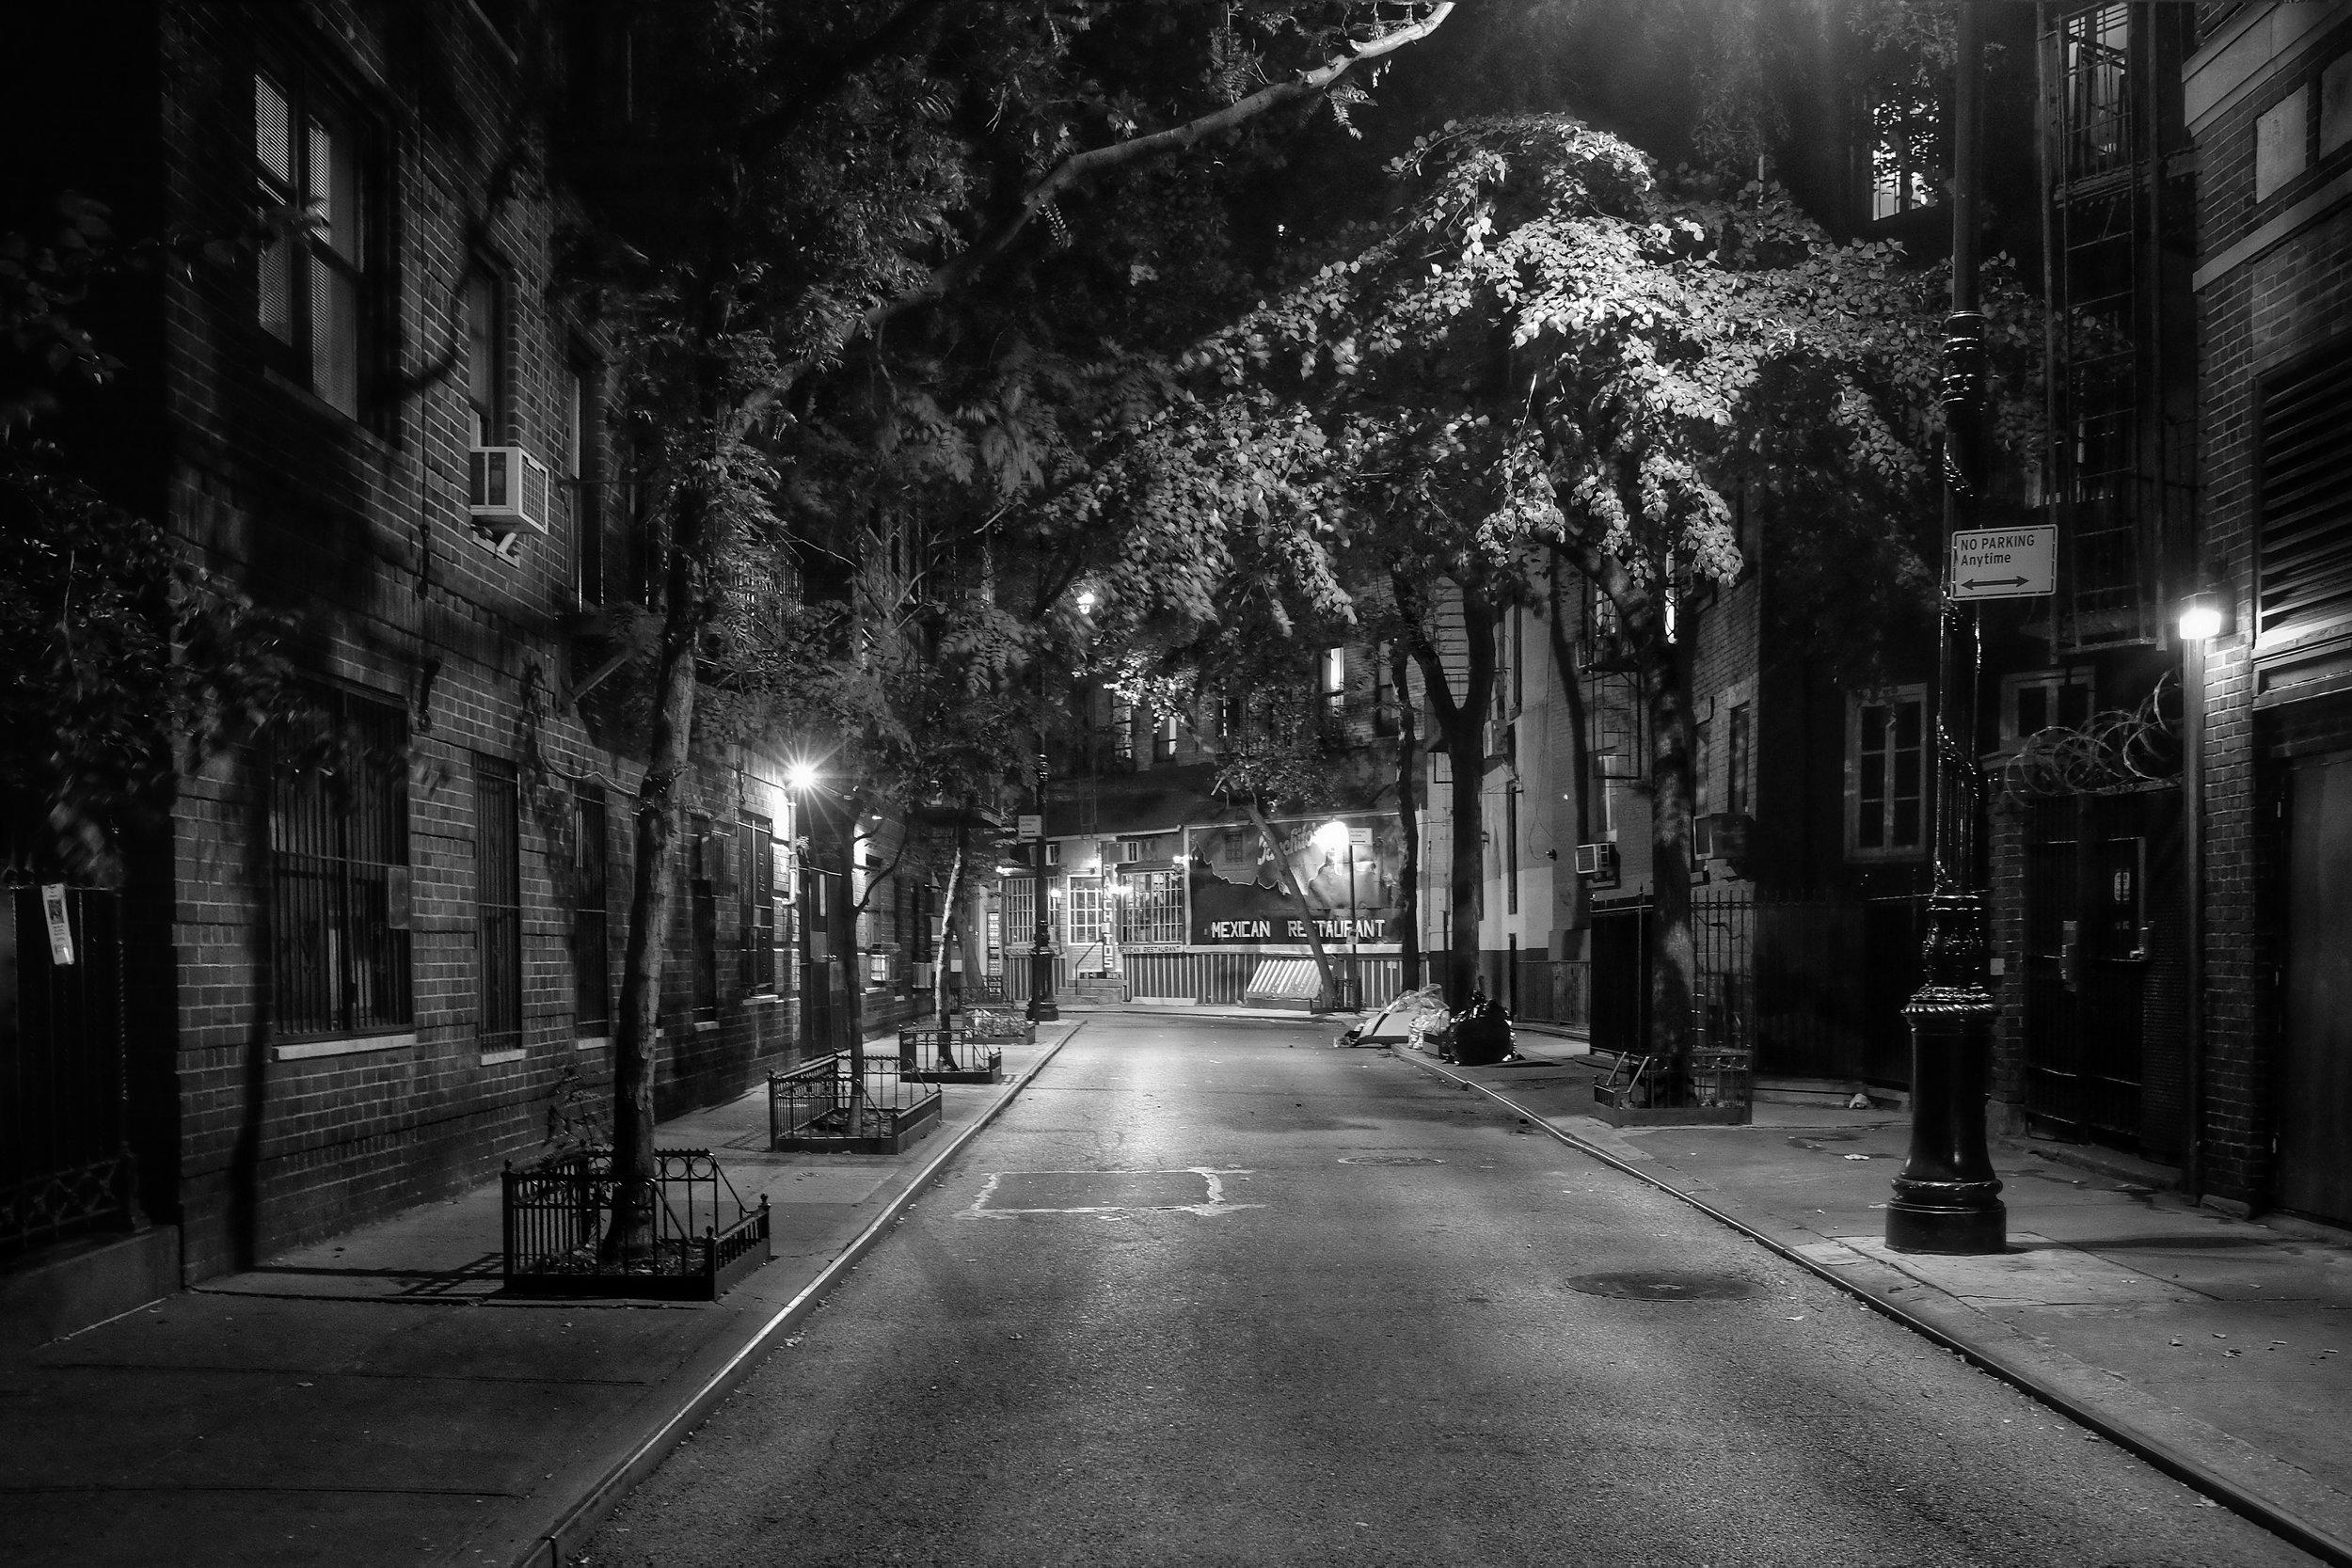 Minetta Street. Greenwich Village. New York City. 2016.